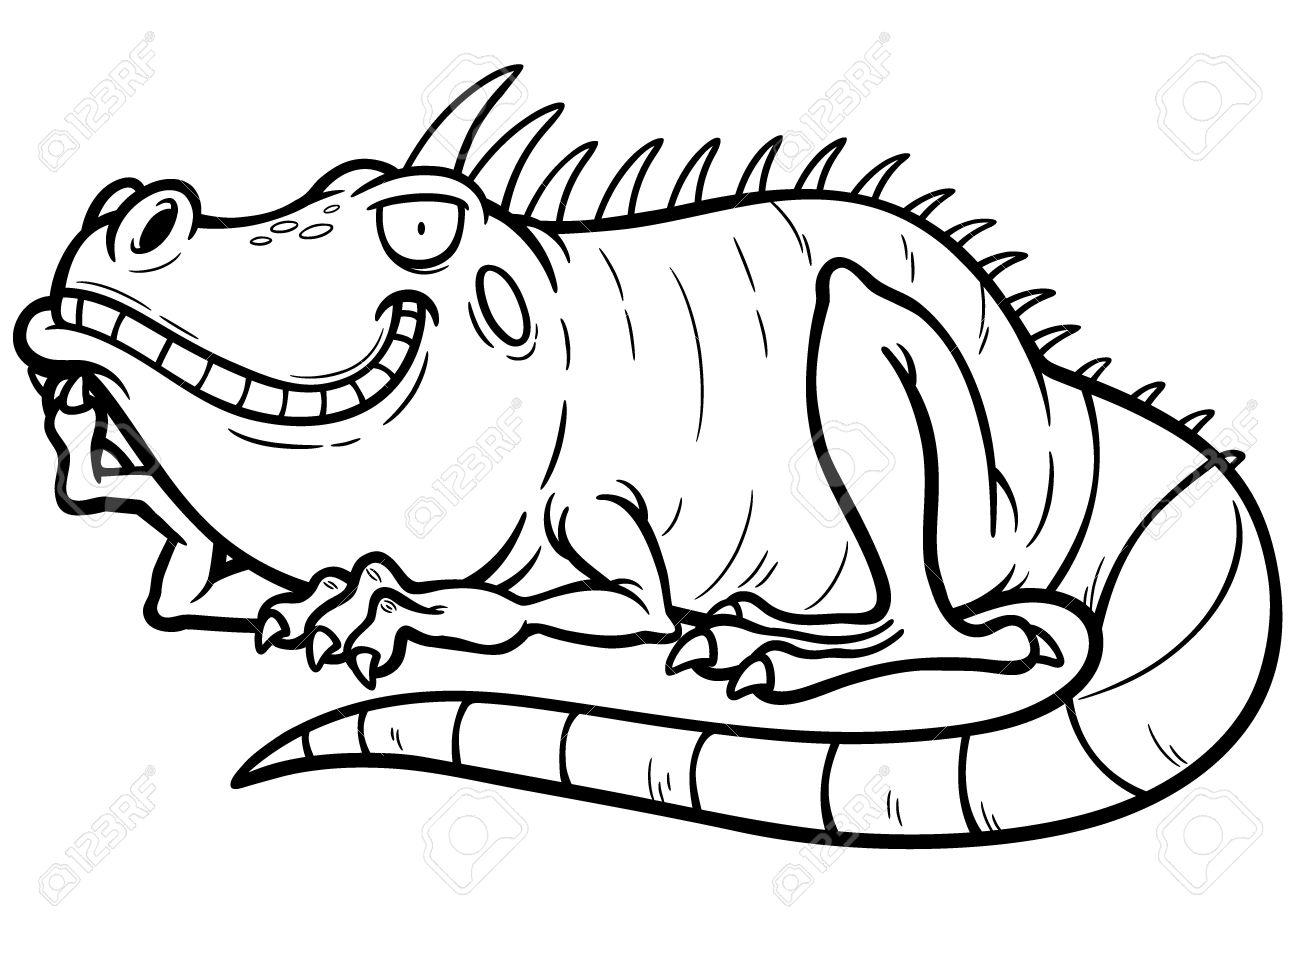 Green Iguana coloring #7, Download drawings